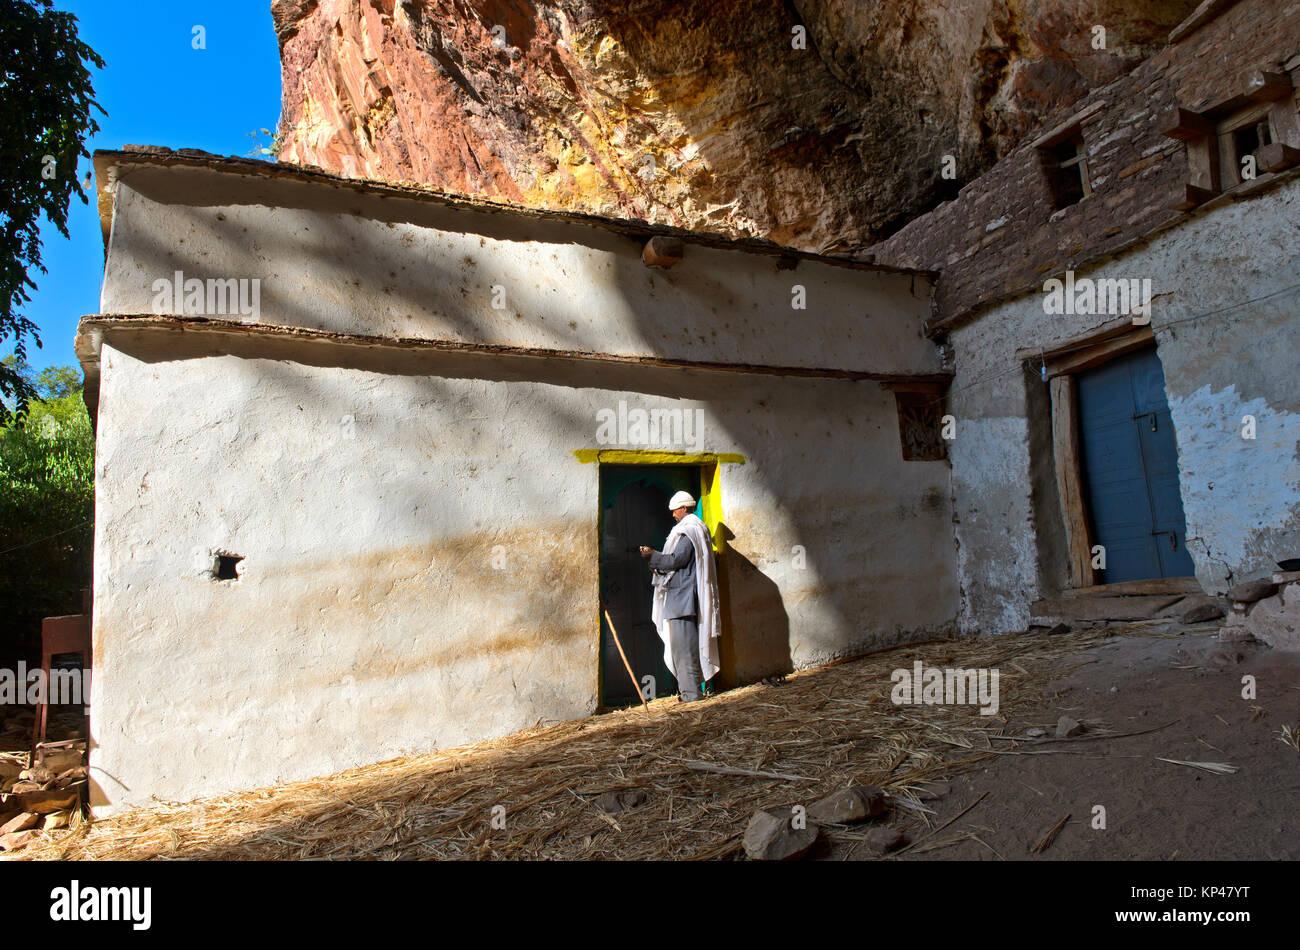 Priest at the entrance to the rock church Maryam Papaseyti, Gheralta, Tigray, Ethiopia - Stock Image